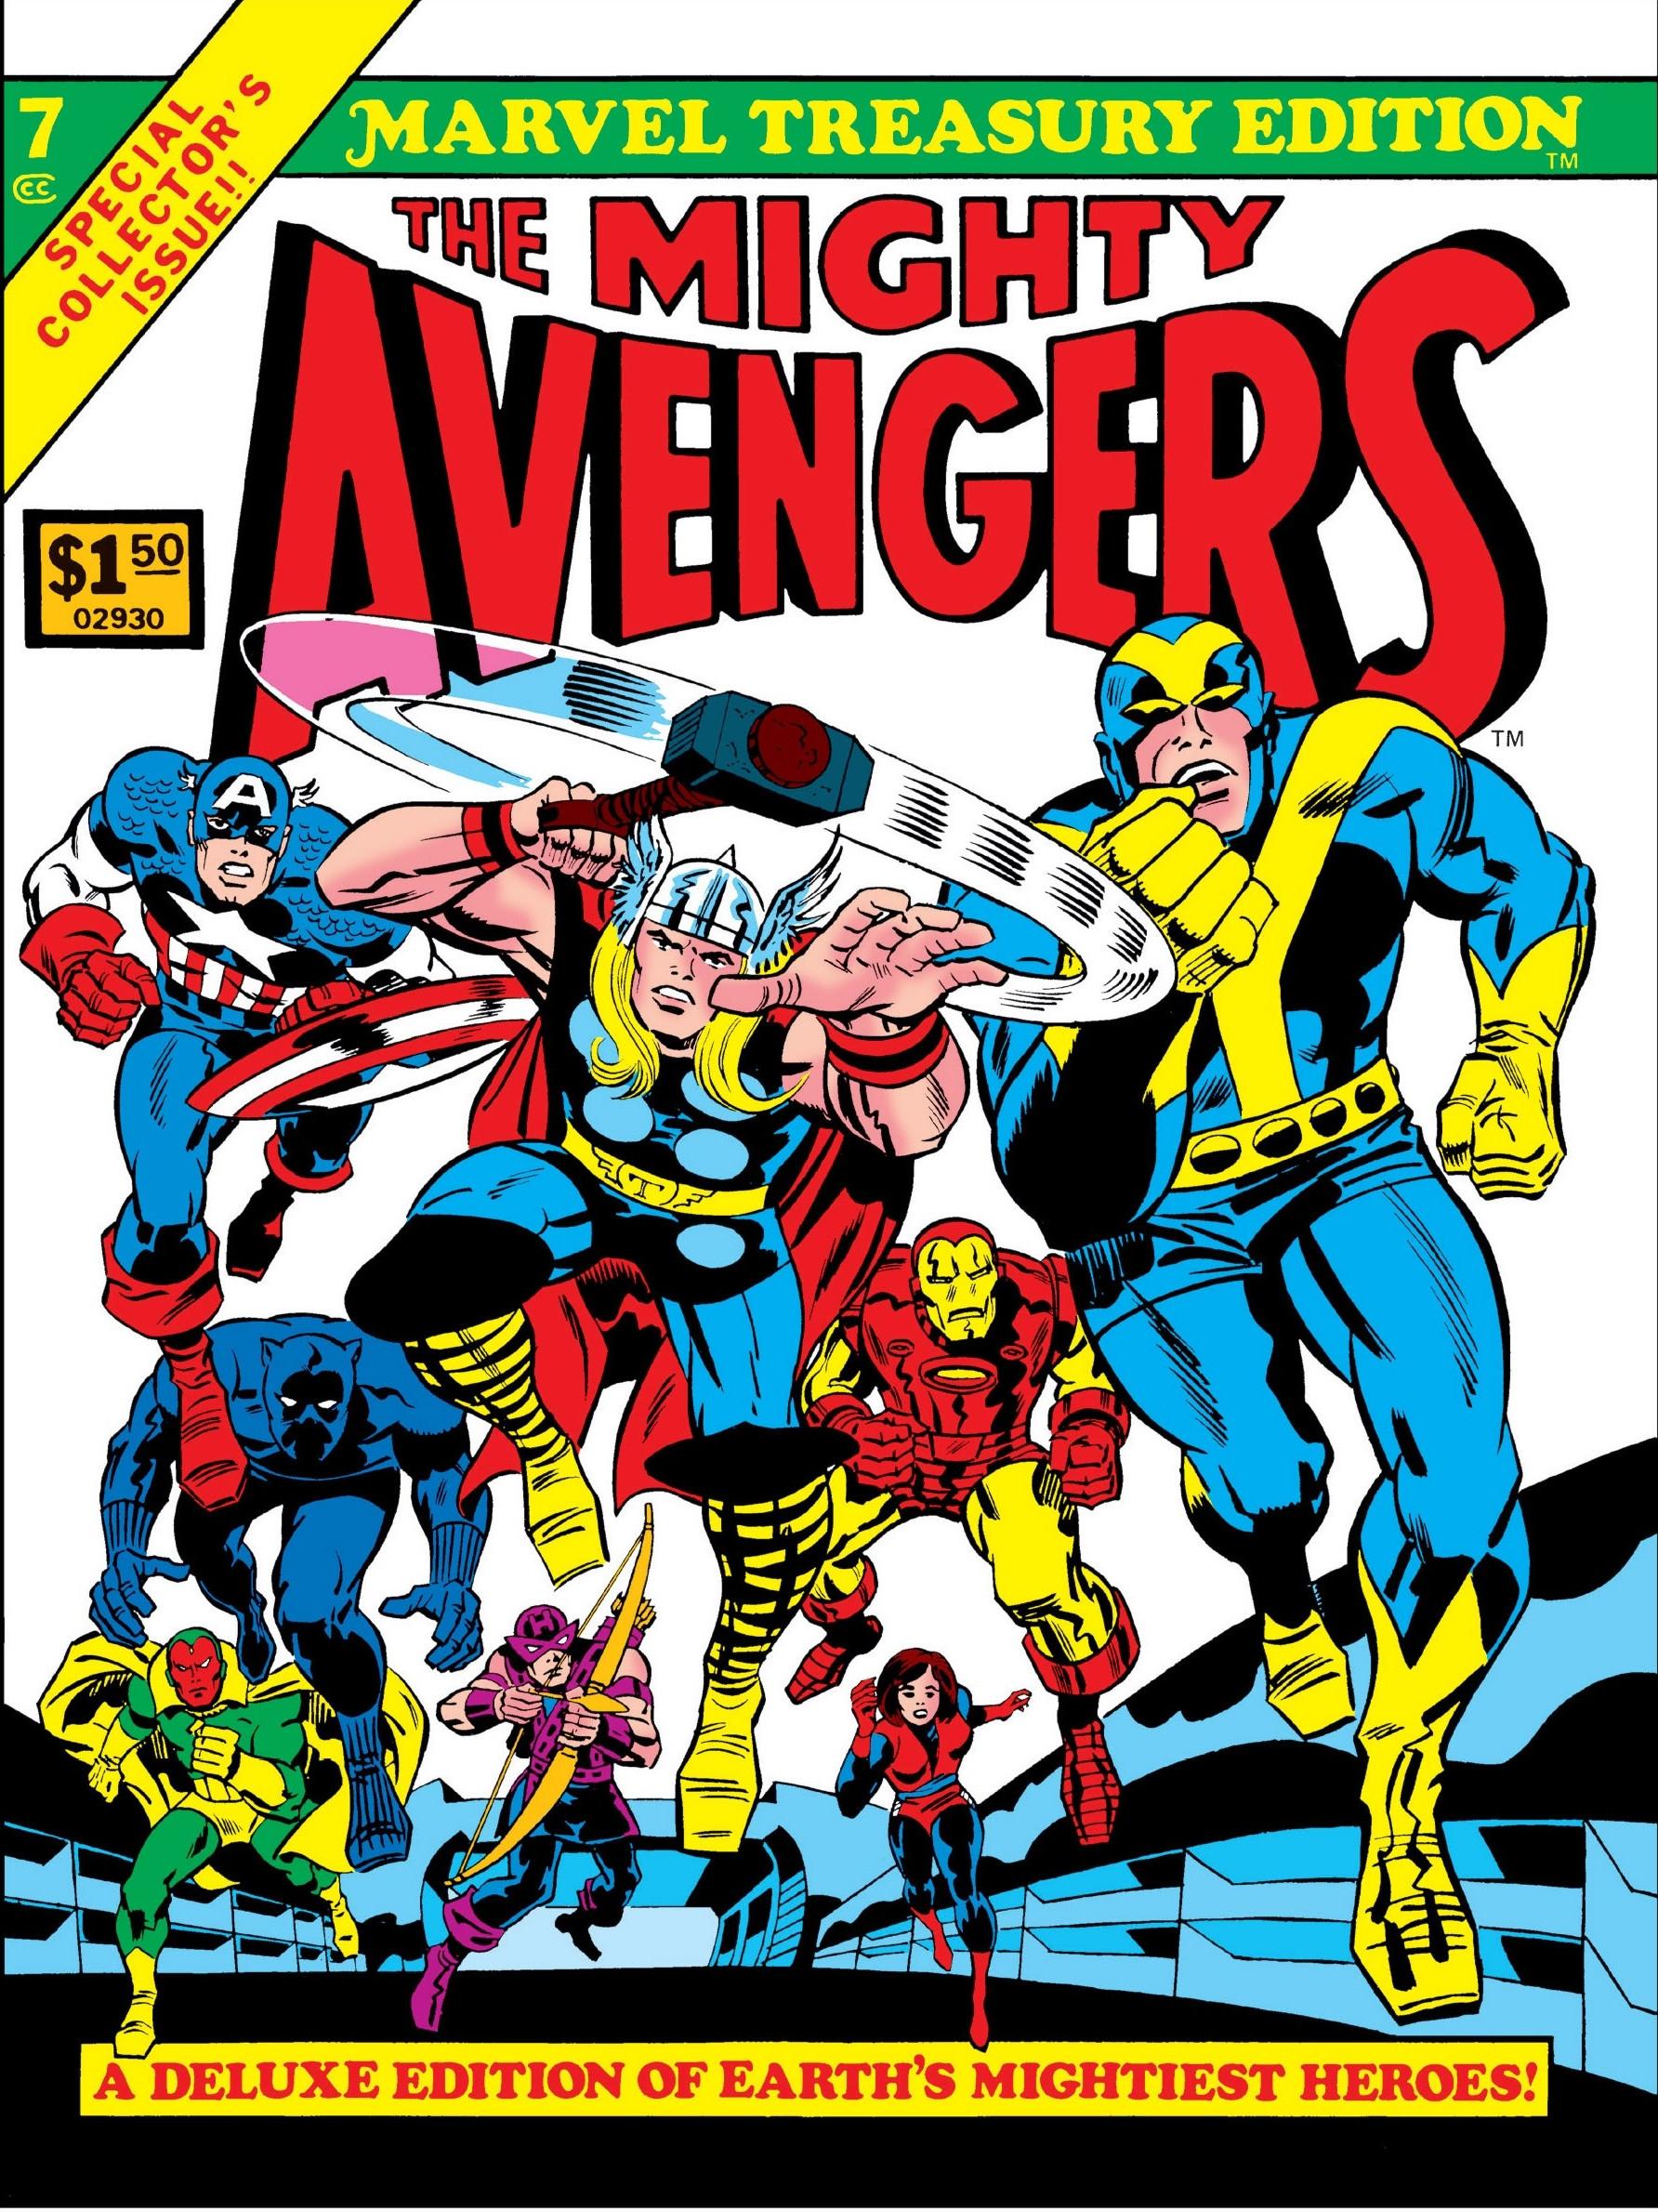 Marvel treasury edition 16 | mars will send no more.